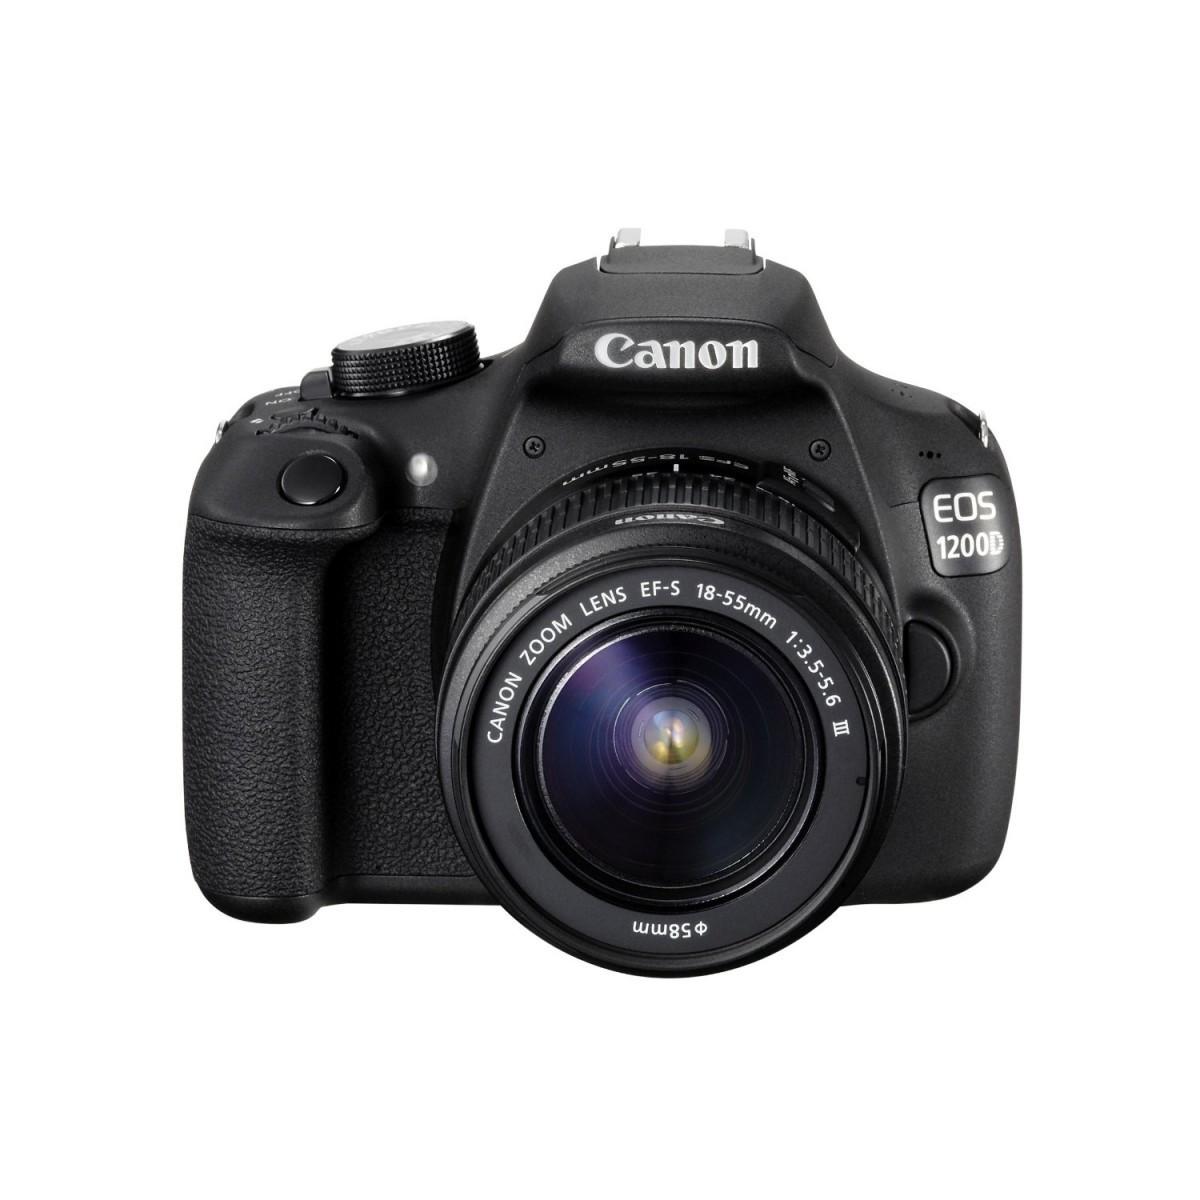 Canon EOS 1200D Kit (18-55mm III) BLACK